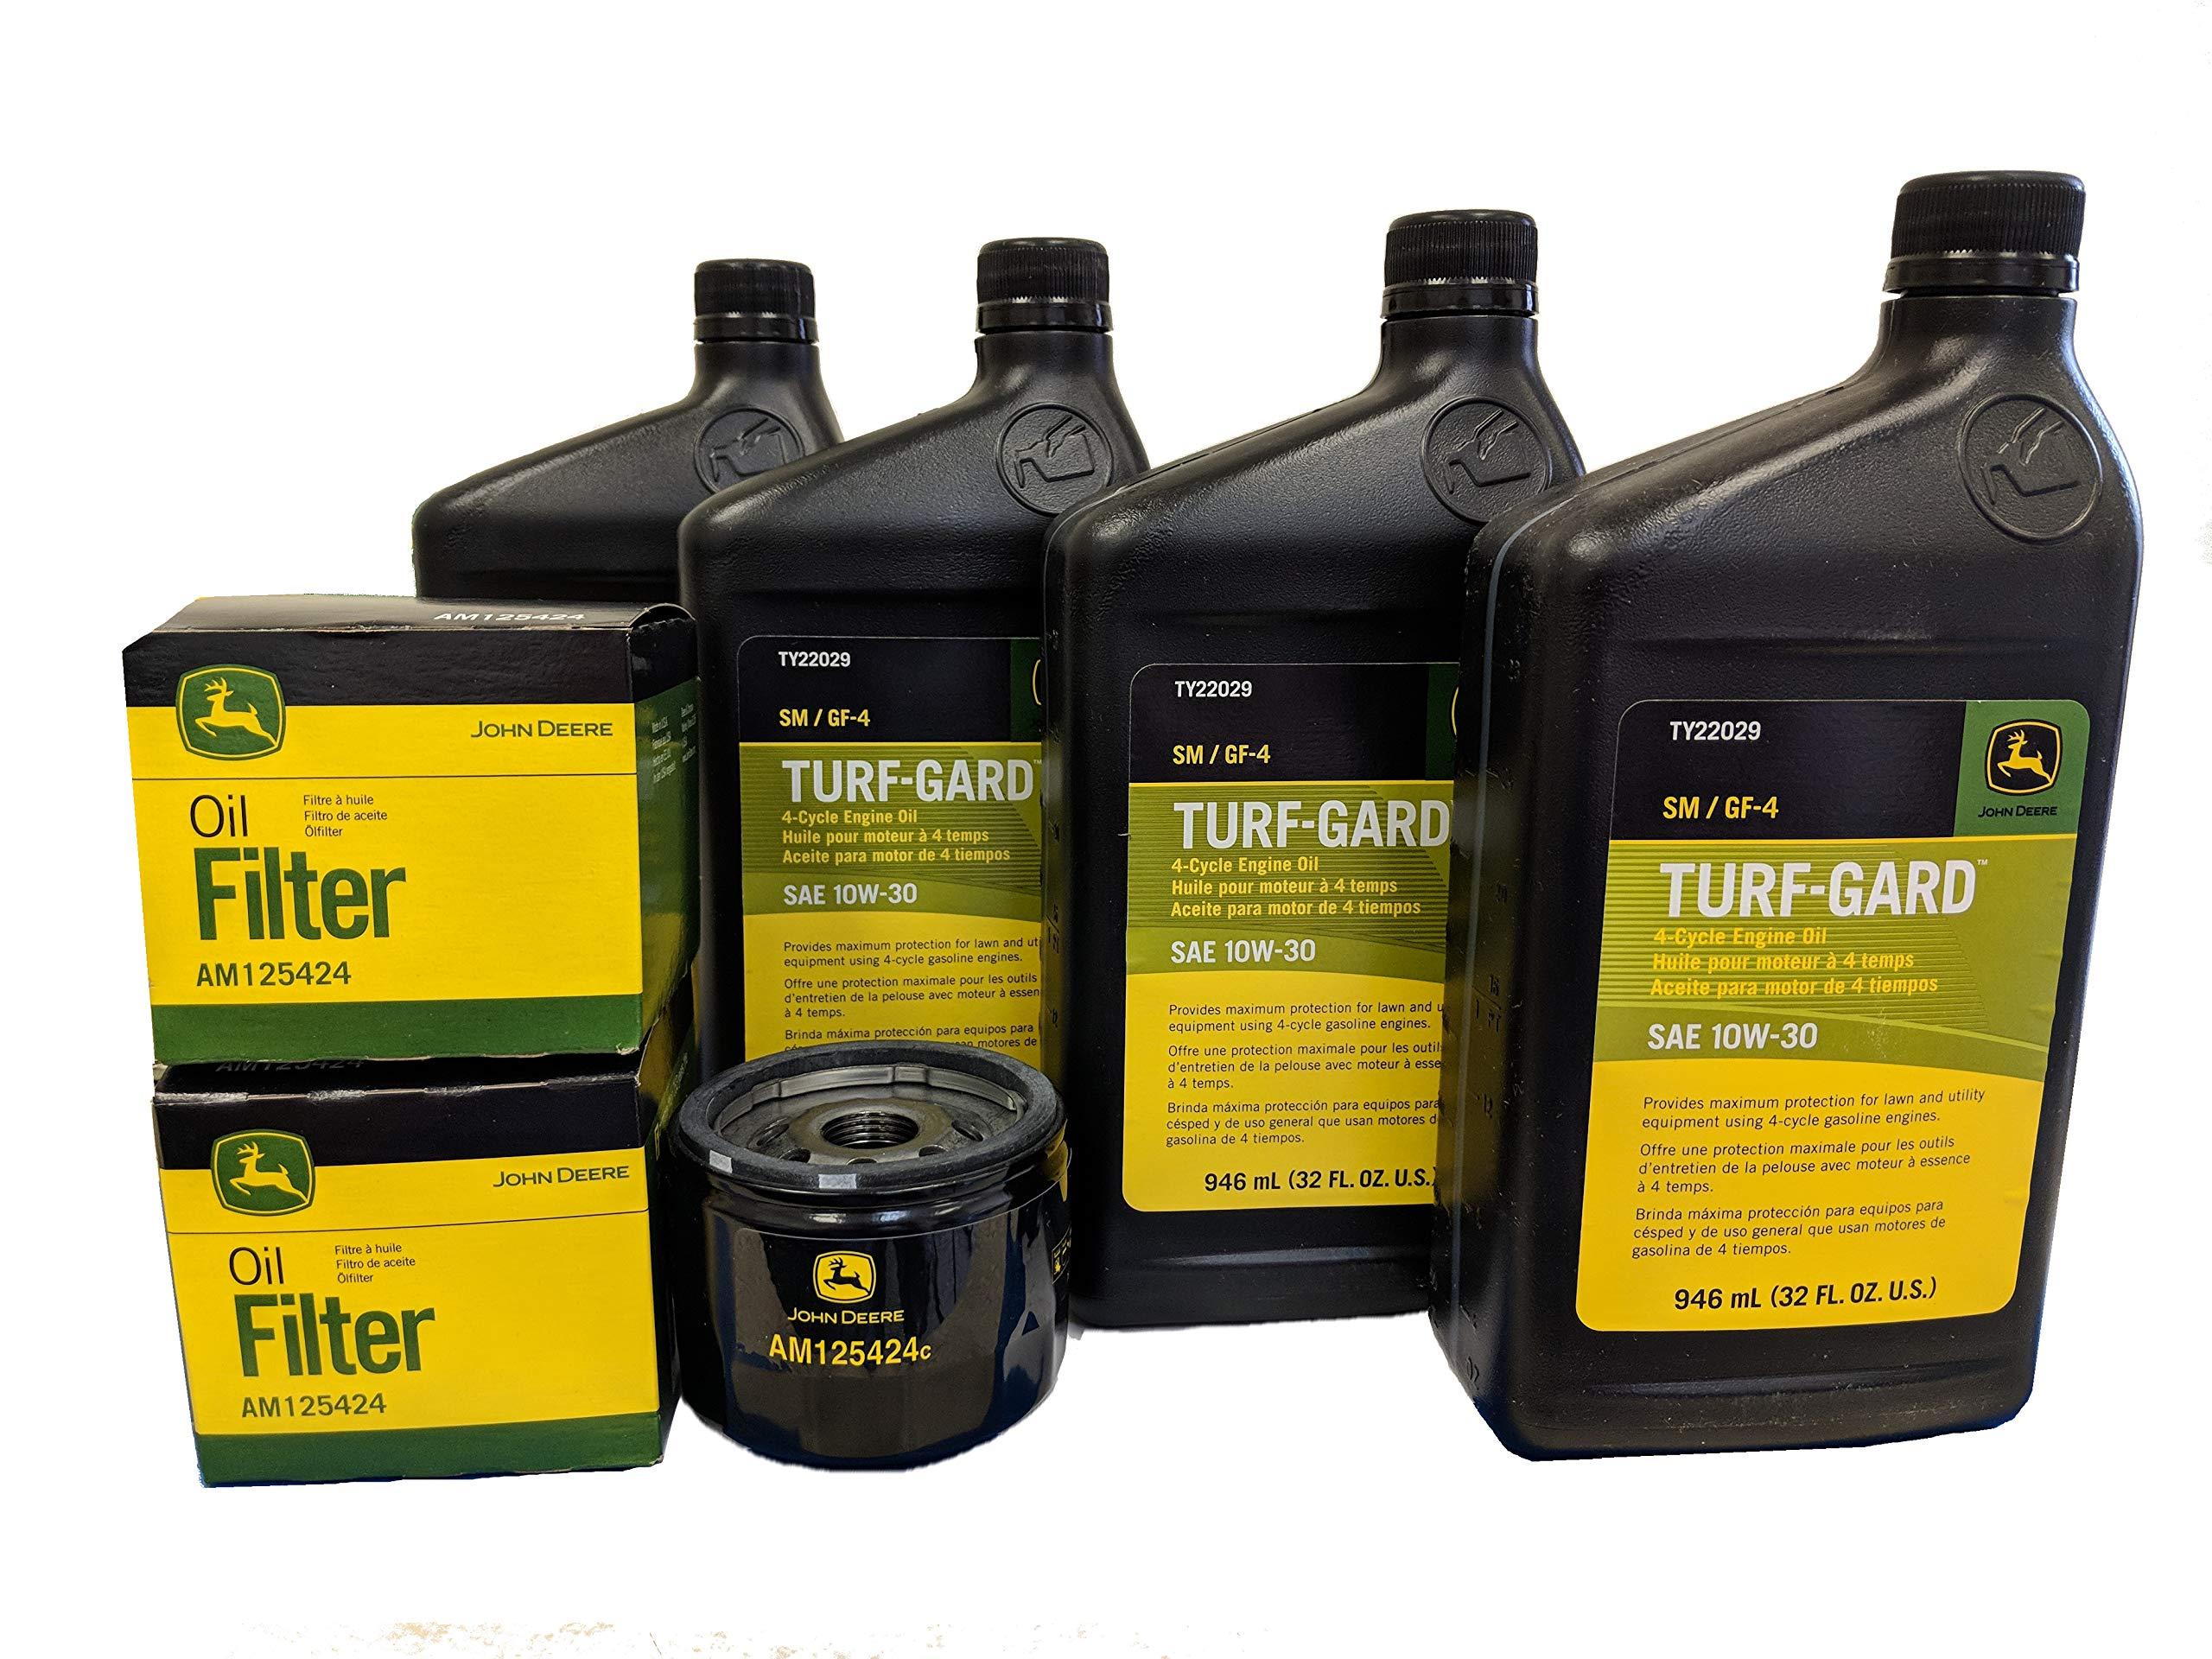 John Deere Original Equipment Double Oil Change Kit - (4) TY22029 + (2) AM125424 by John Deere